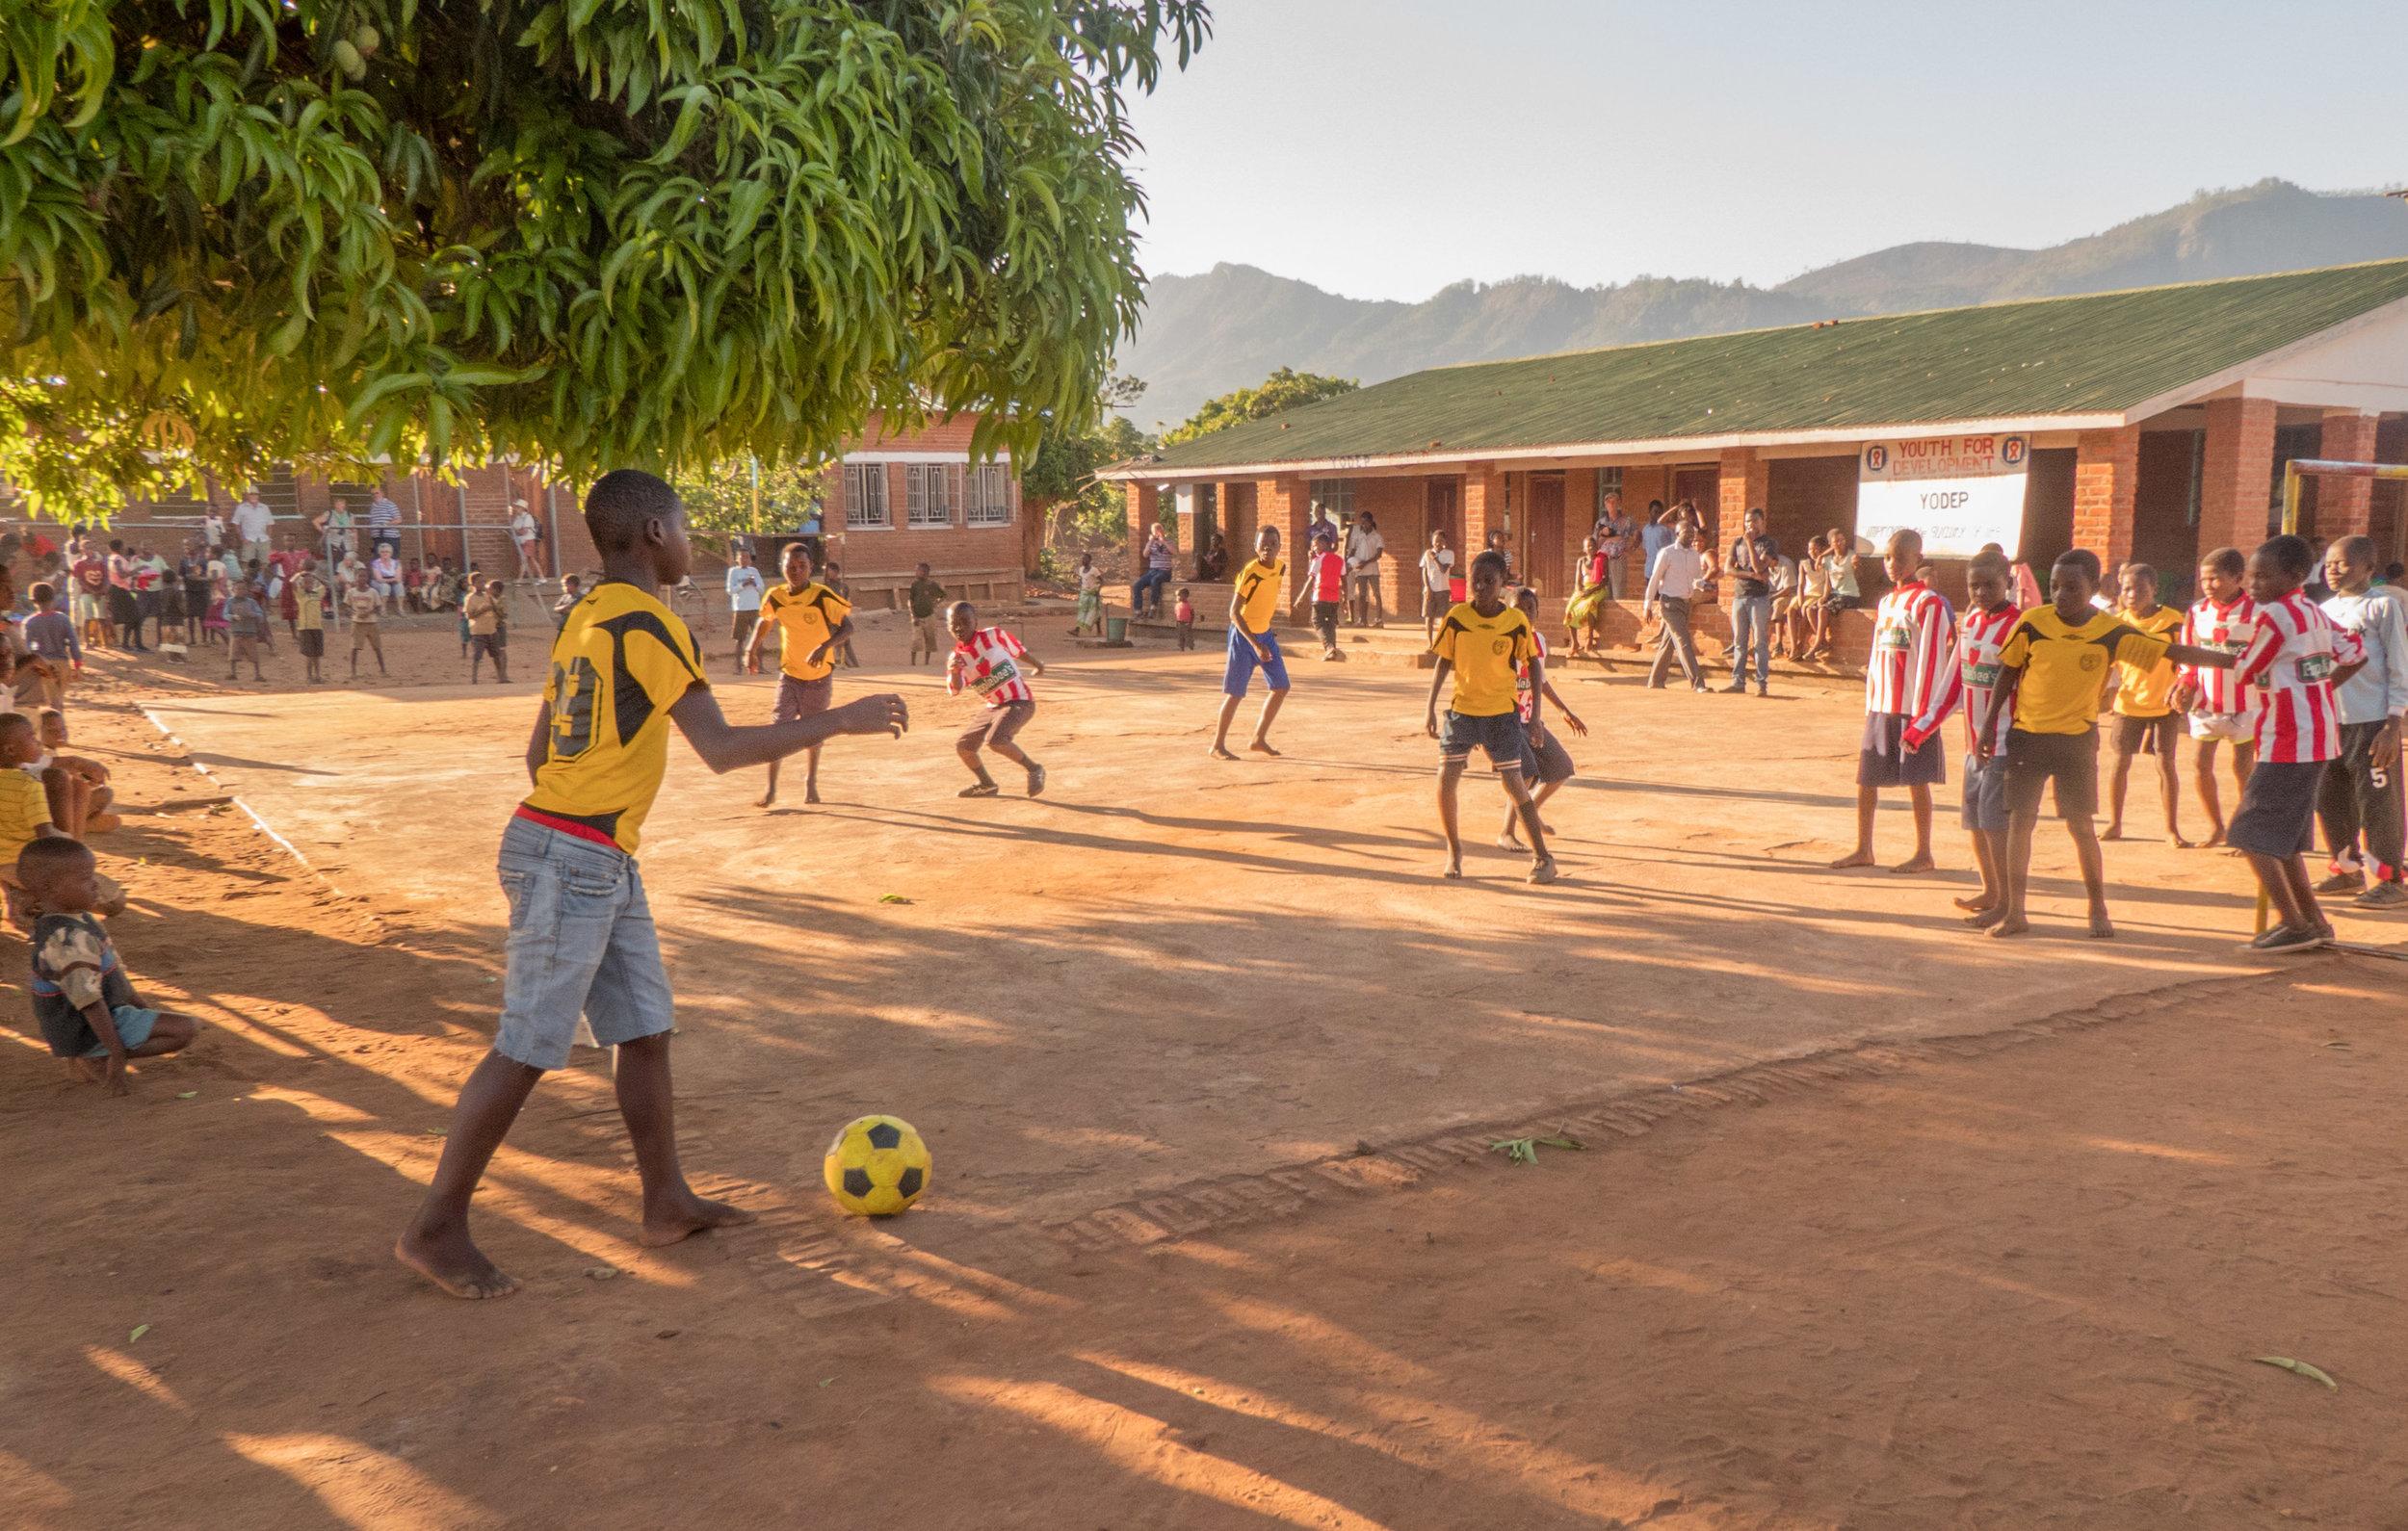 YODEP, Malawi